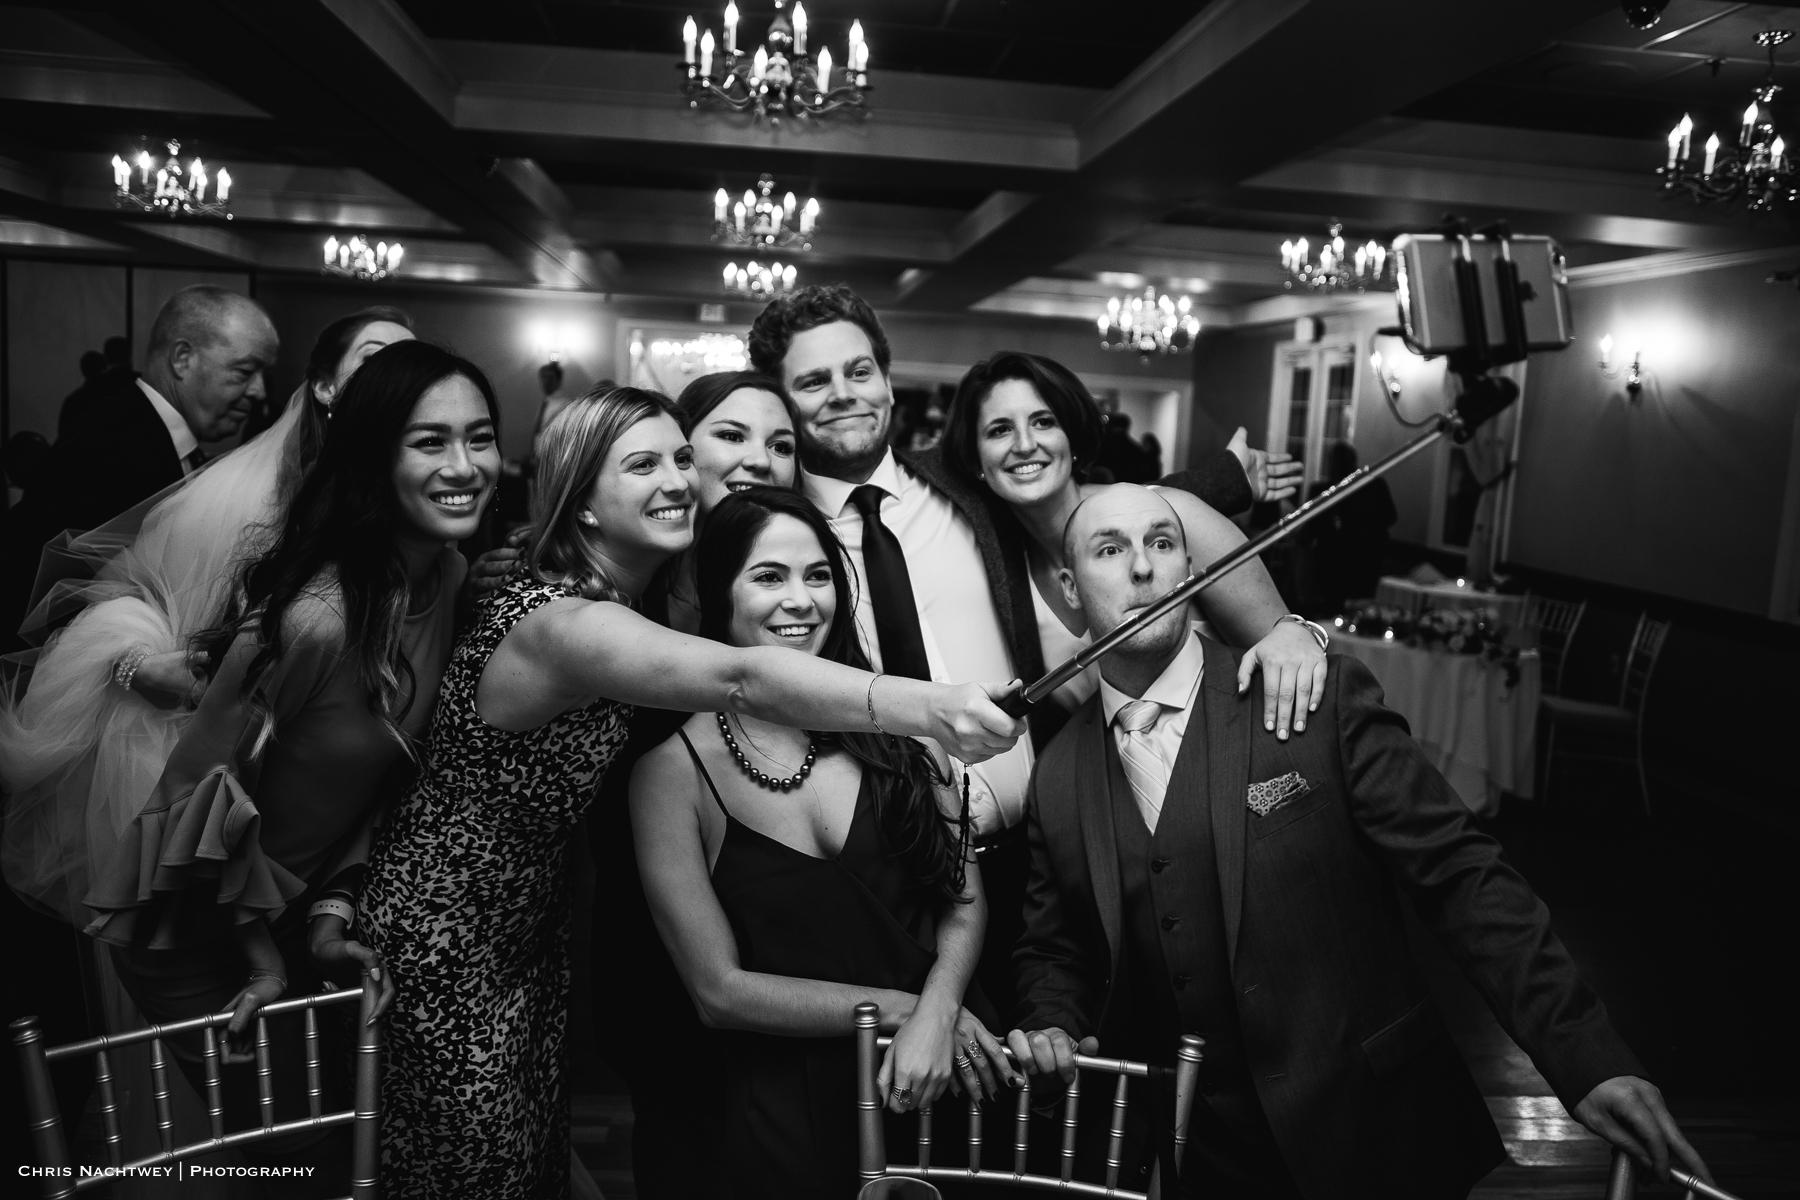 wedding-the-litchfield-inn-ct-photos-chris-nachtwey-photography-2018-55.jpg